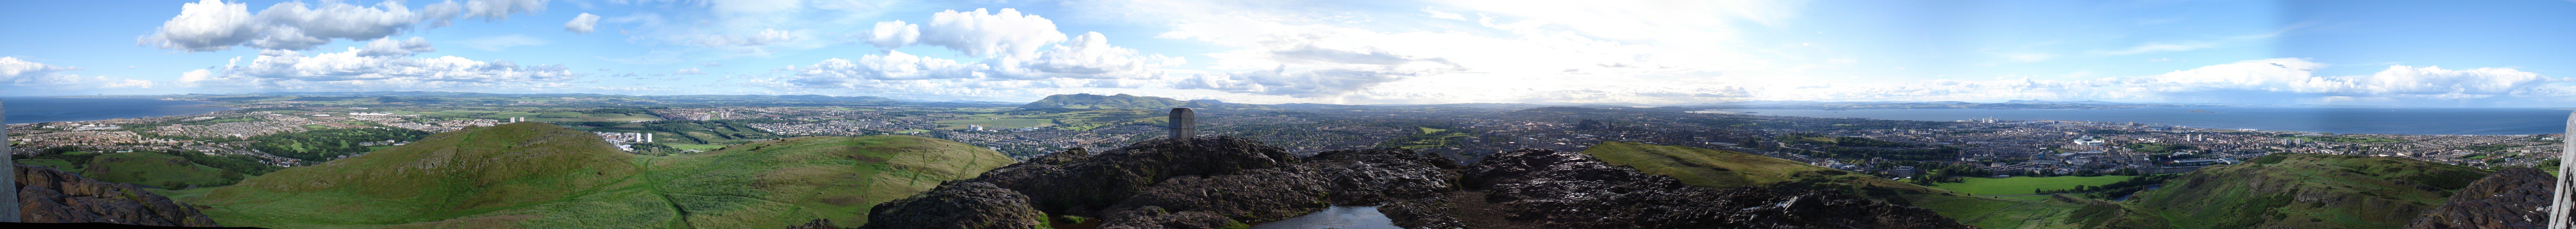 Arthur's Seat Hill panorama